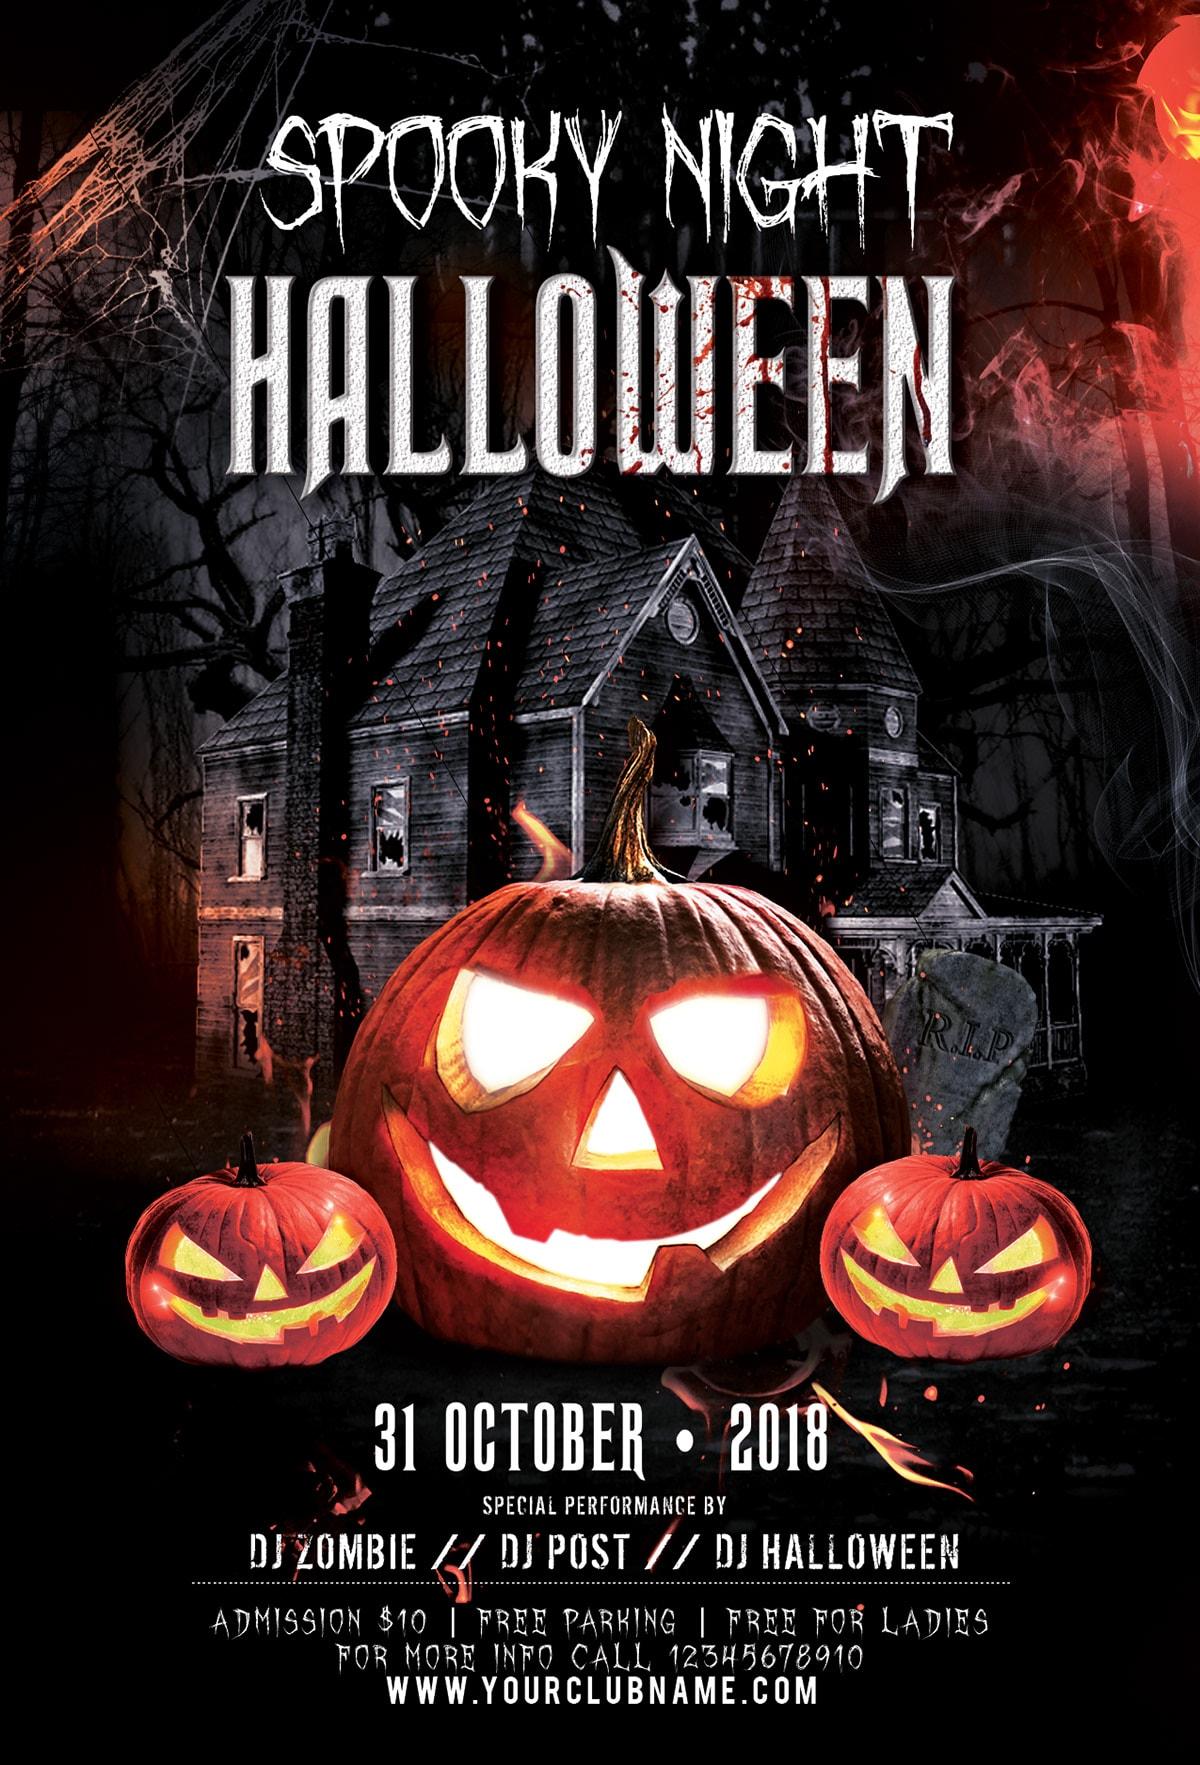 Spooky Night Halloween Psd Flyer Template Stockpsd